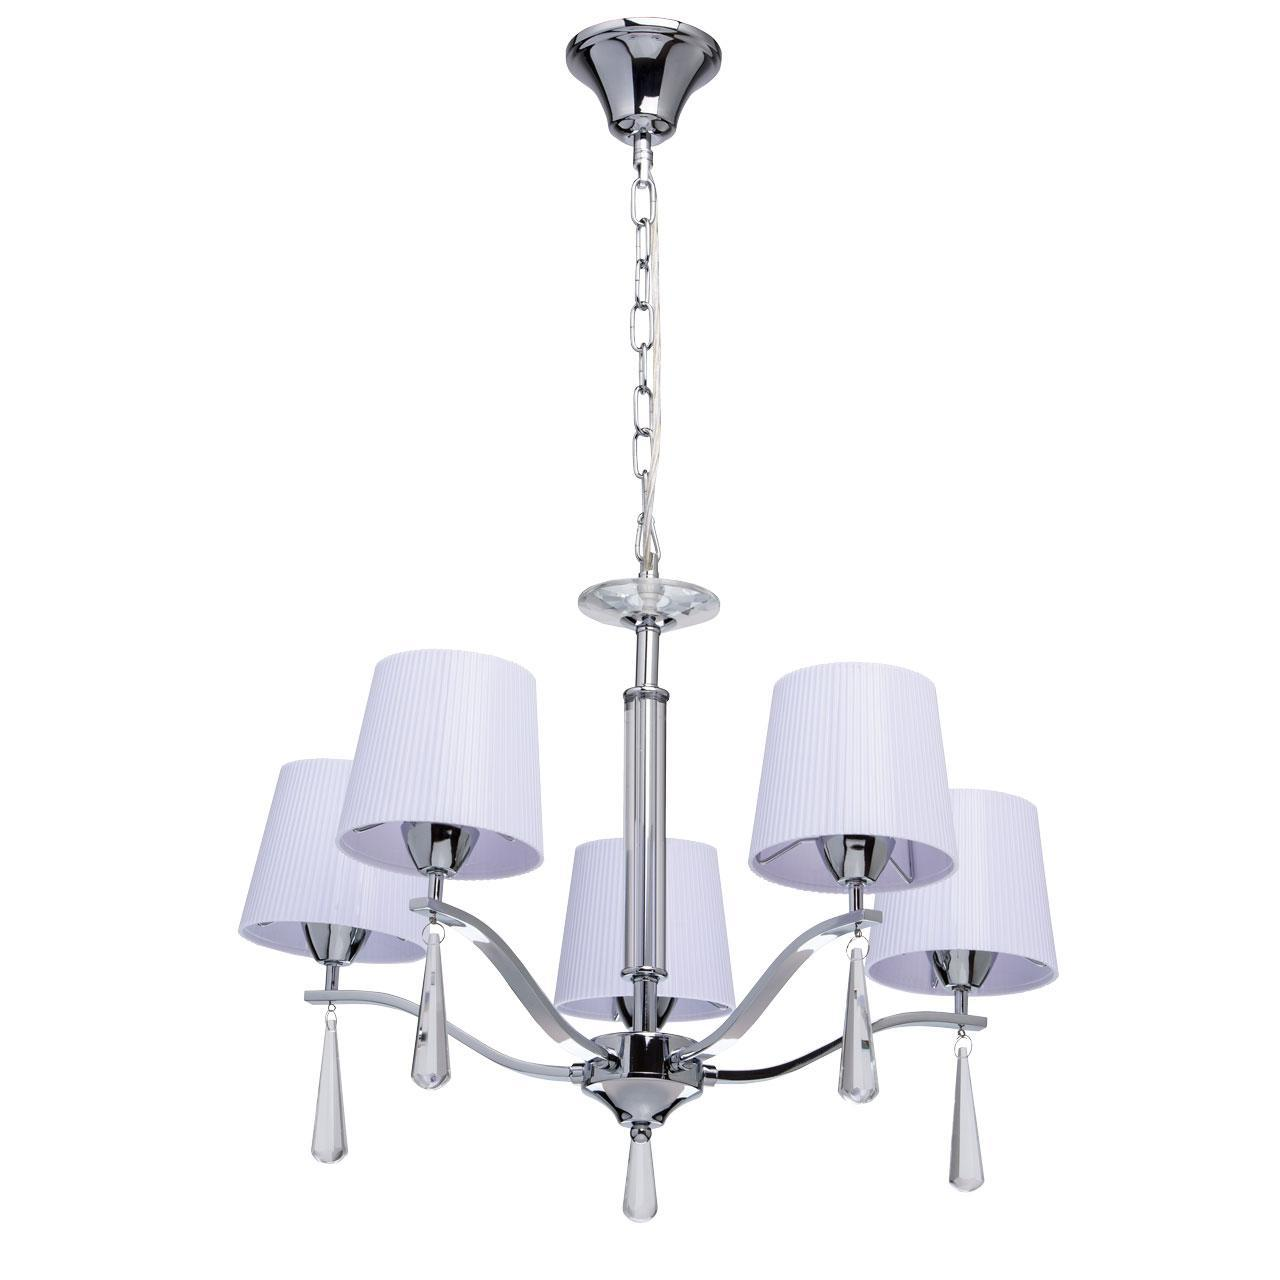 все цены на Люстра MW-Light Прато 2 101011105 подвесная онлайн